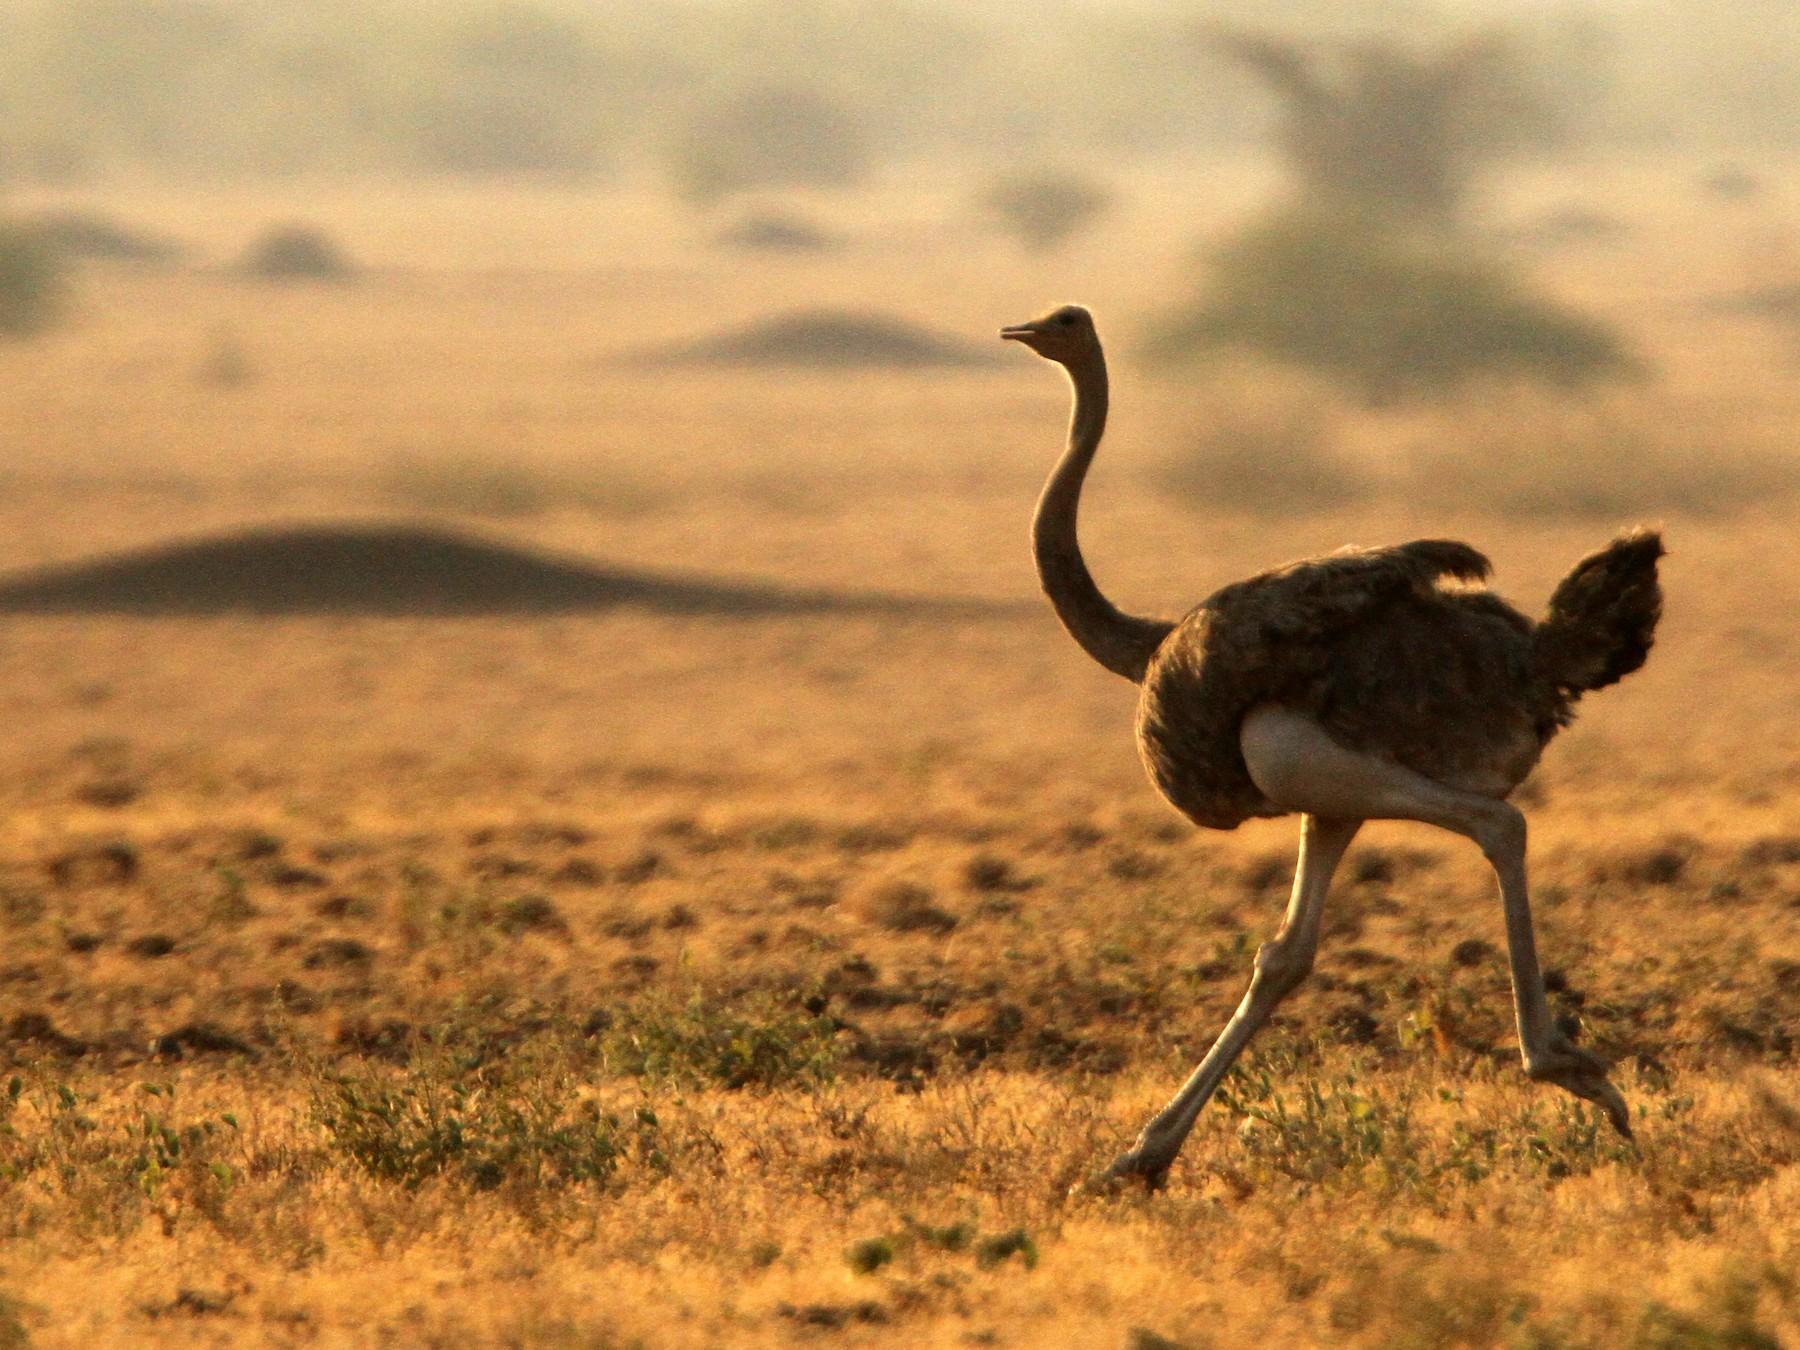 Somali Ostrich - Luke Seitz